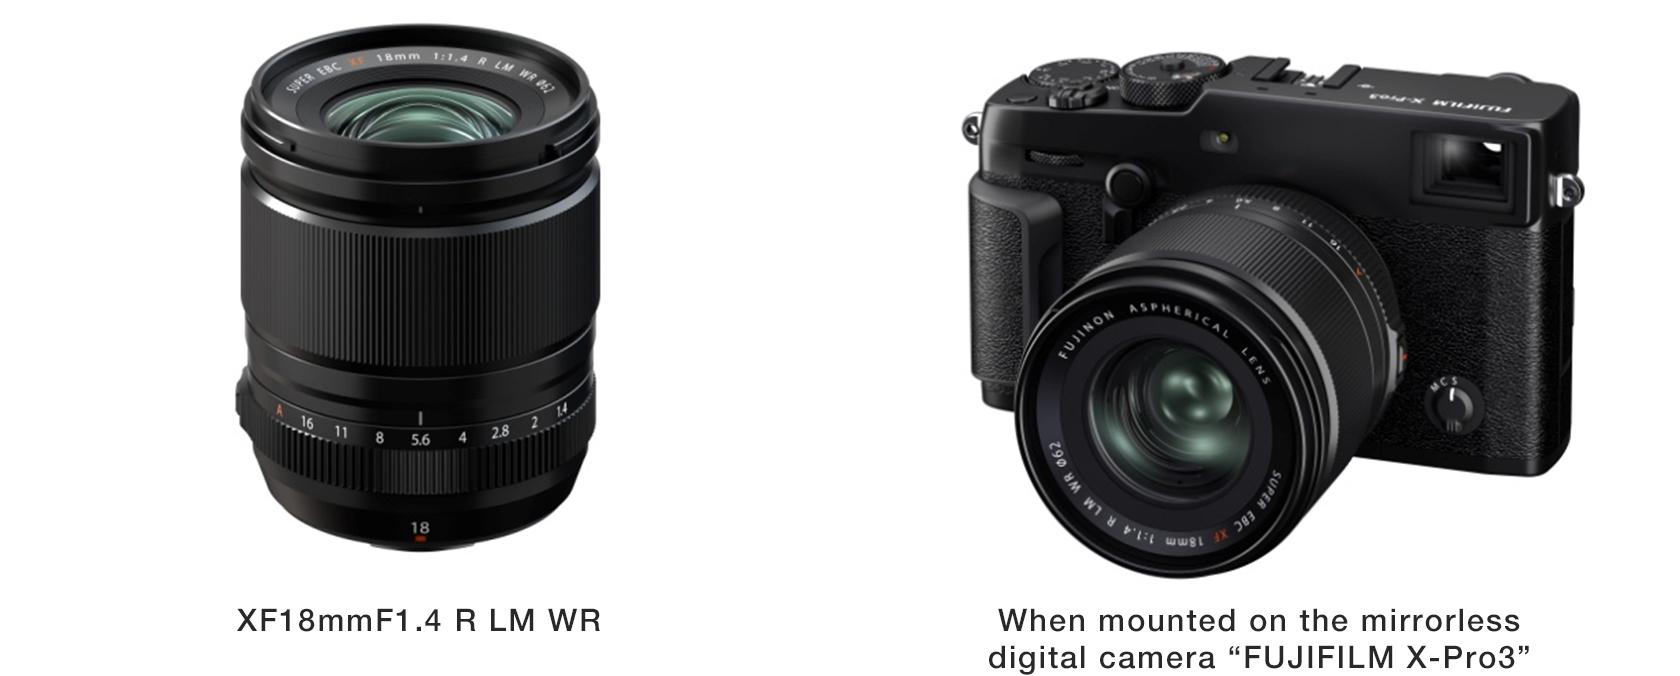 FUJINON Lens XF18mmF1.4 R LM WR